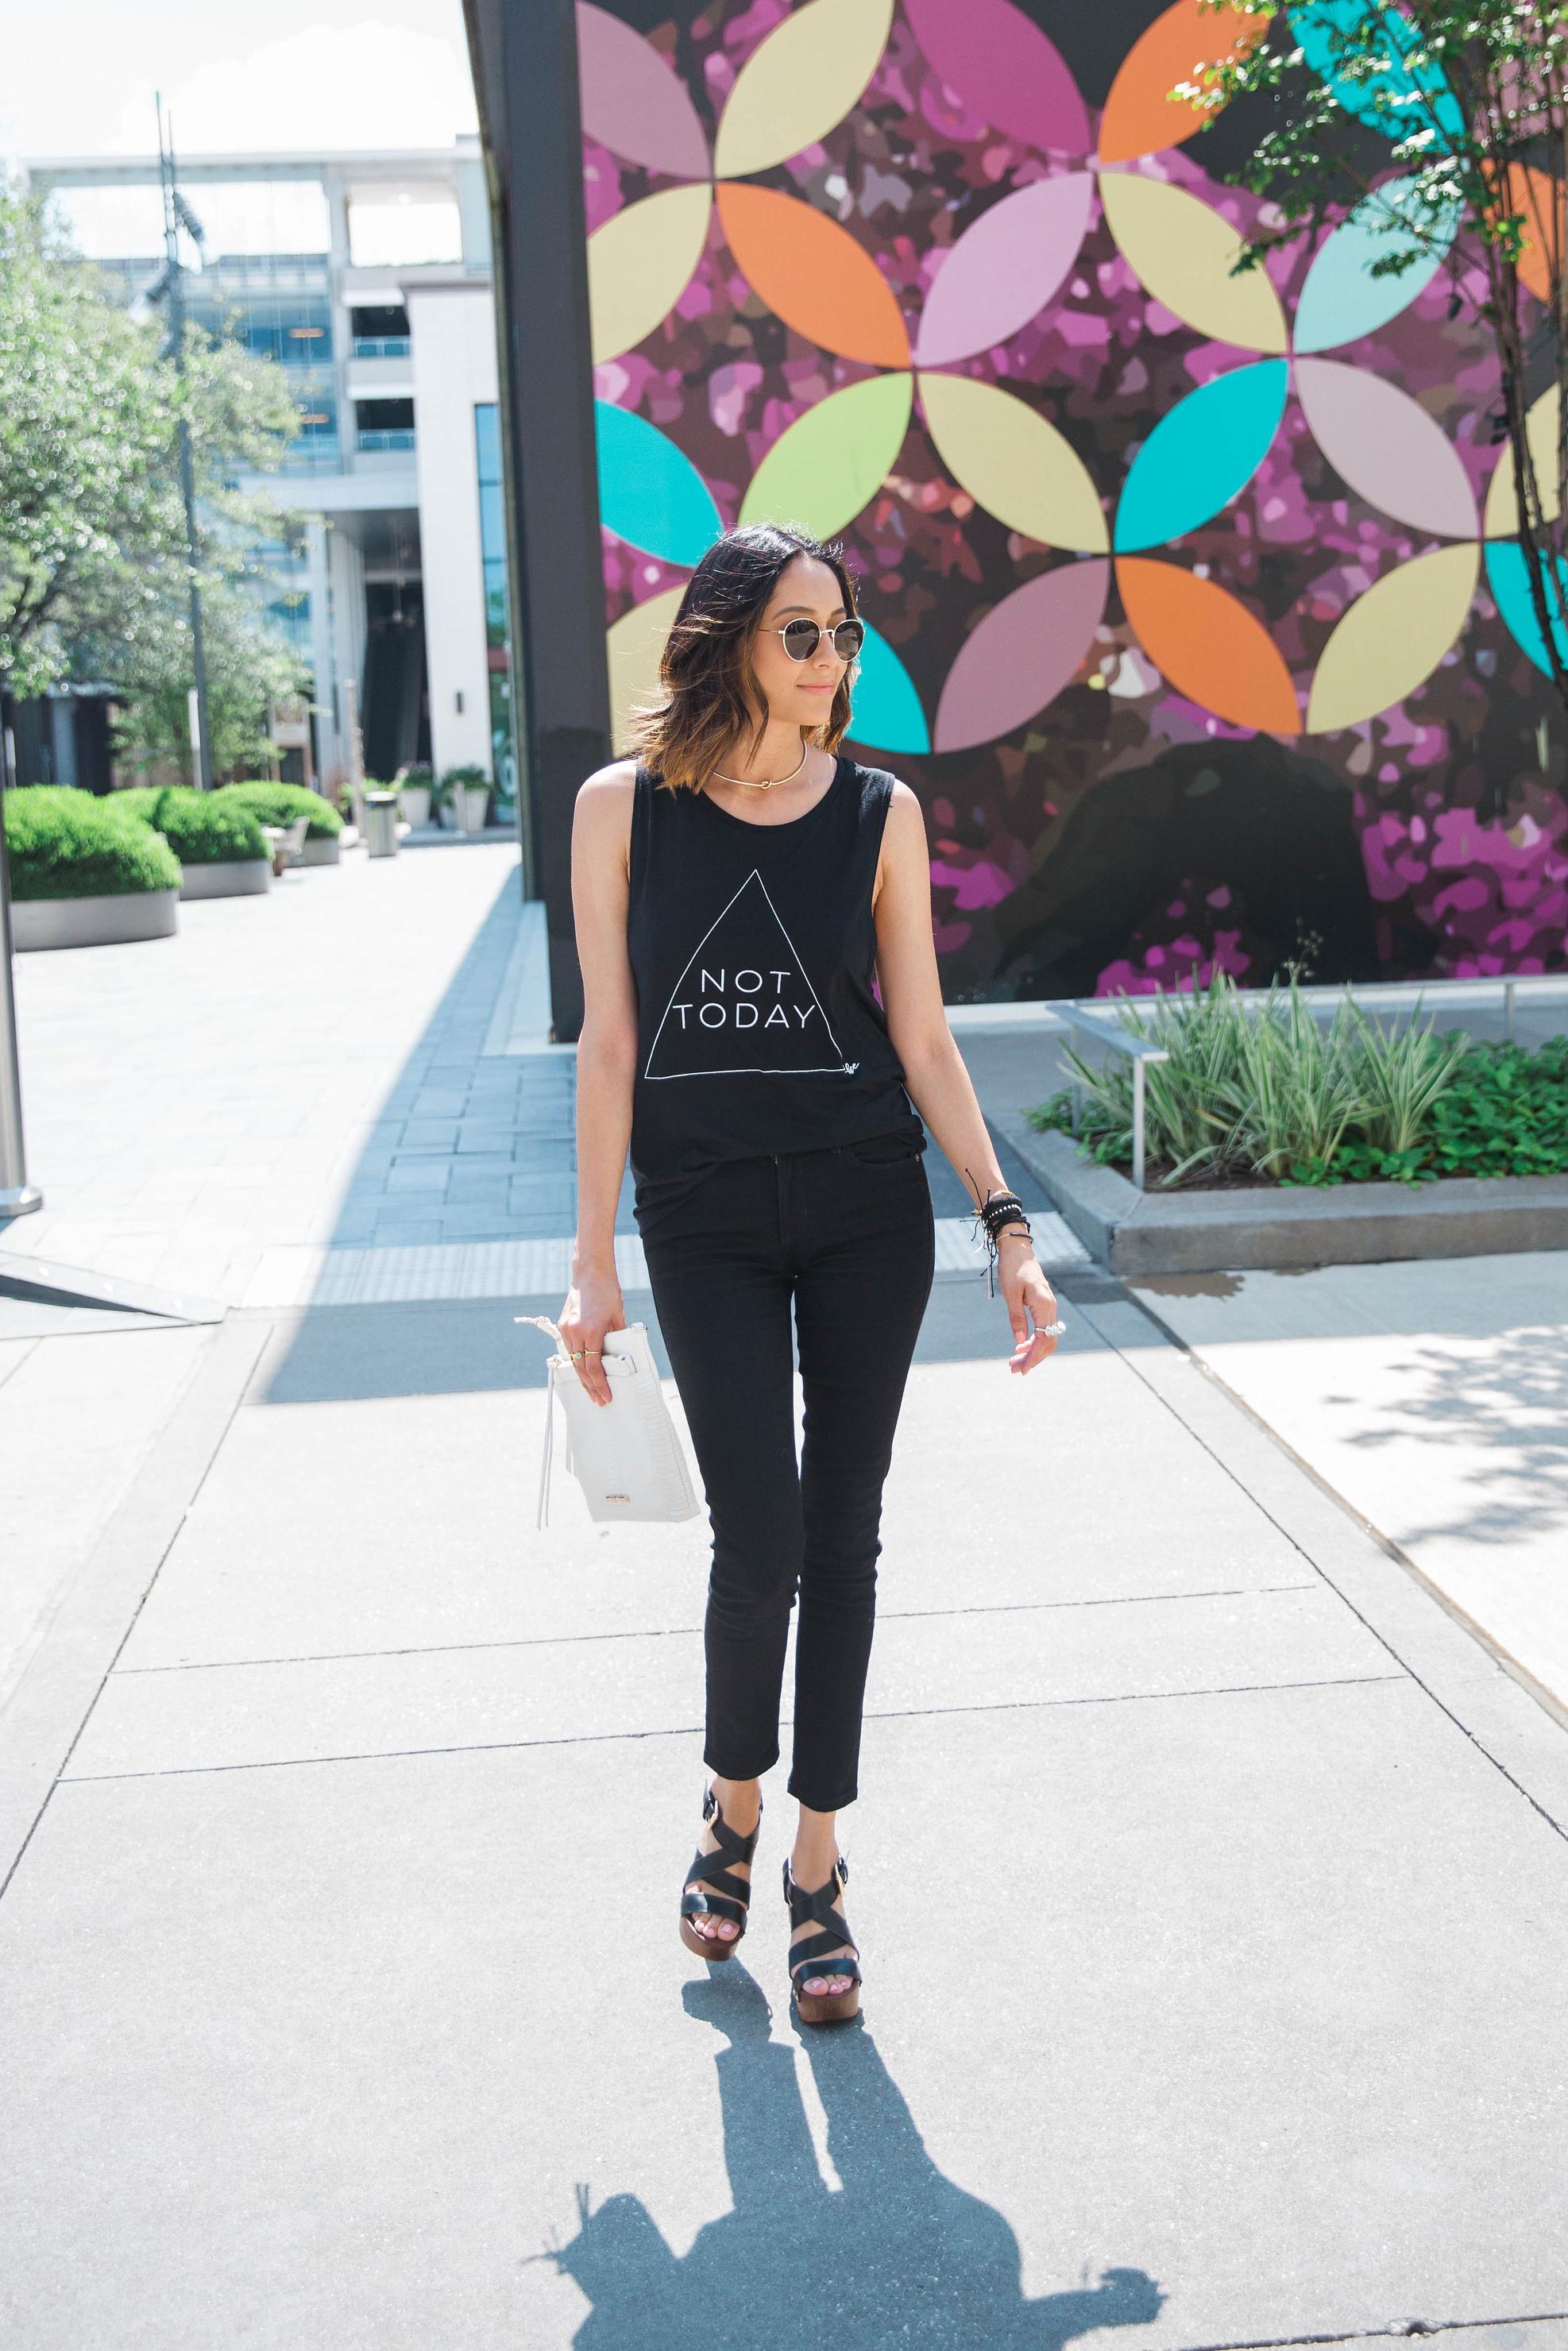 Edgy Look | Black Skinny Jeans | Not Today Printed Tee |Platform Sandals